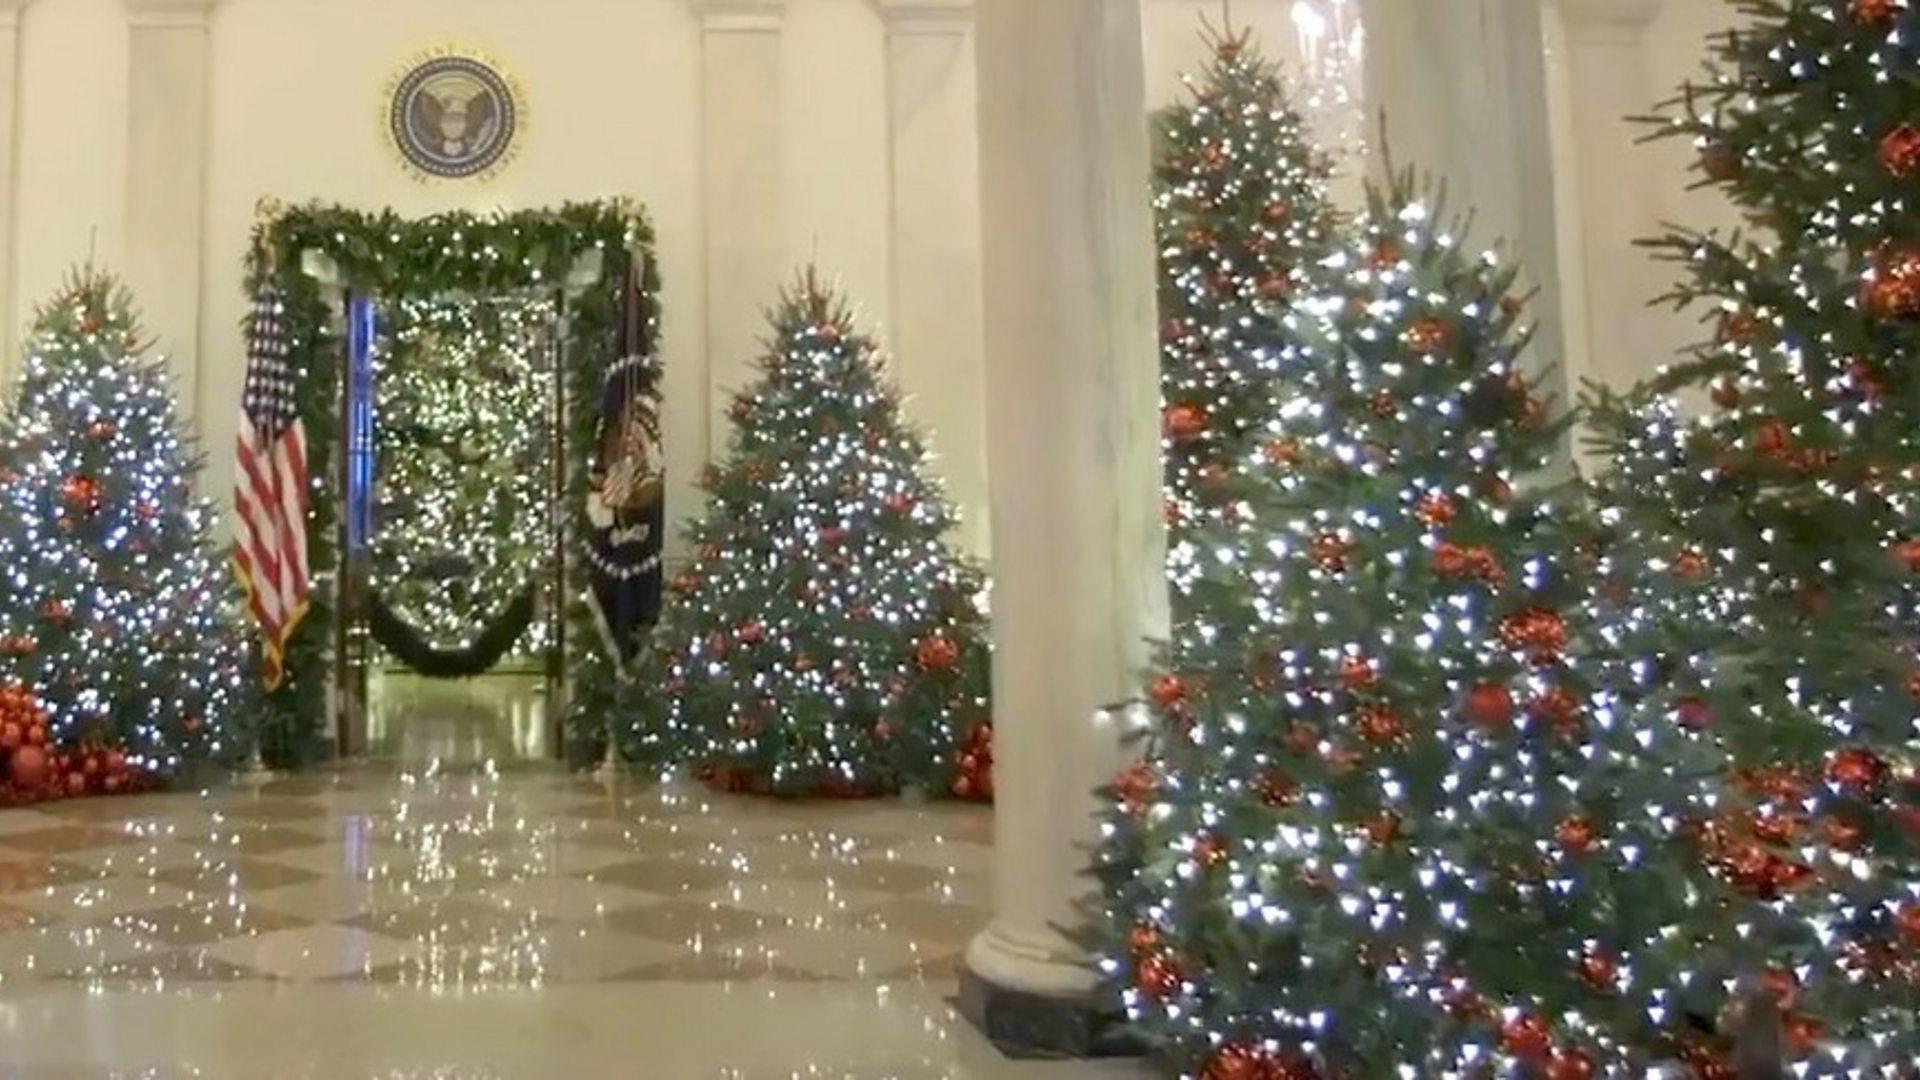 2021 Whitehouse Christmas Melania Trump Unveils White House Christmas Decorations Bbc News